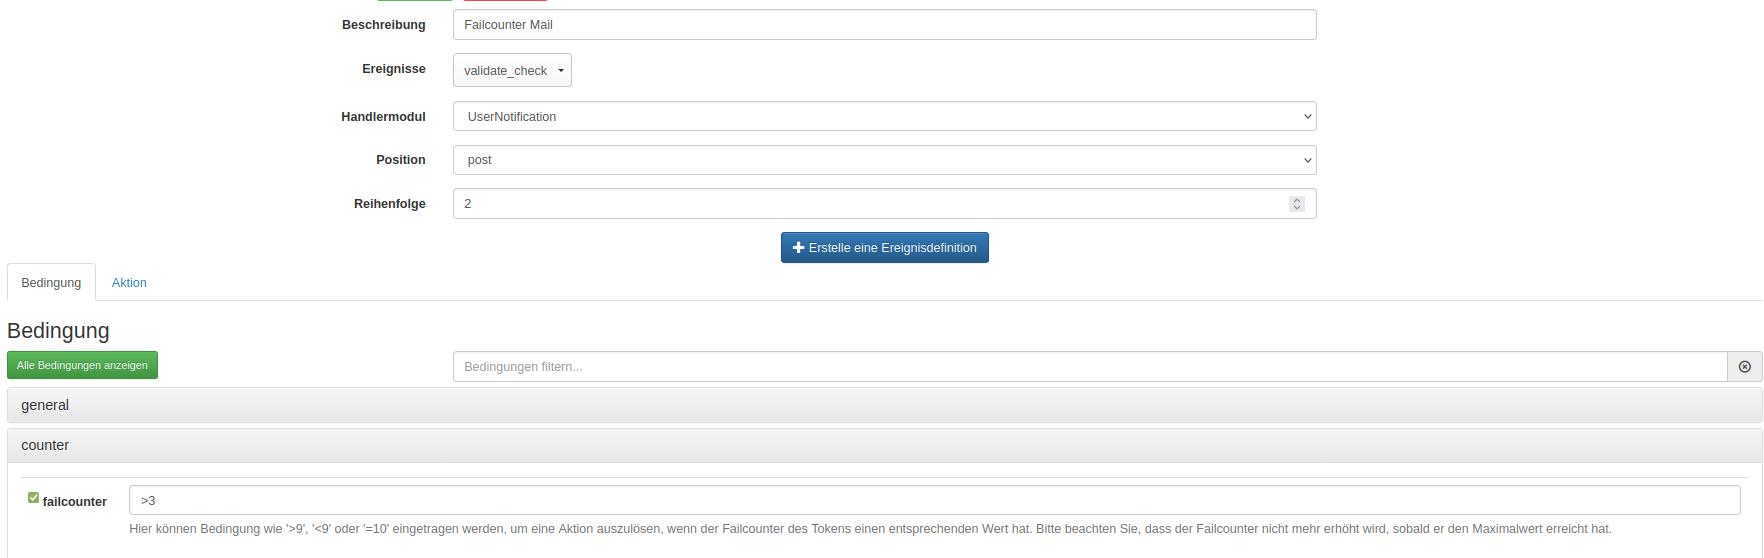 Firefox_Screenshot_2021-07-15T07-21-54.448Z